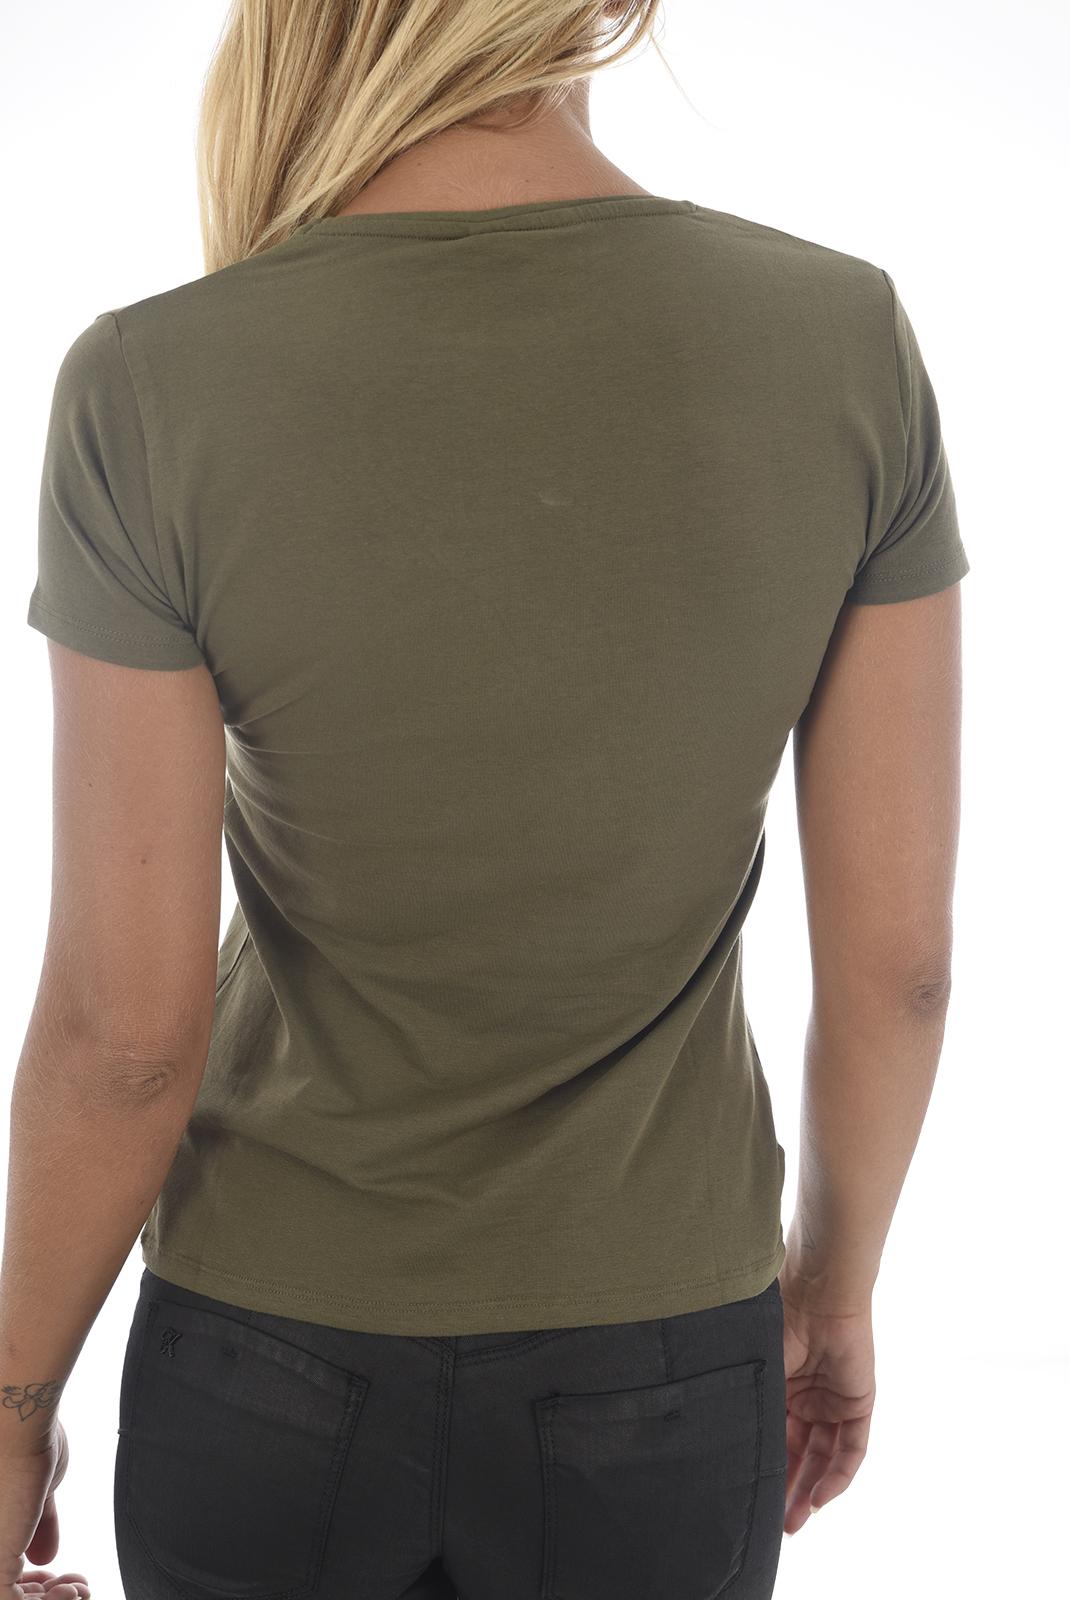 Tee shirt  Kaporal TINE H18W11 CAMP